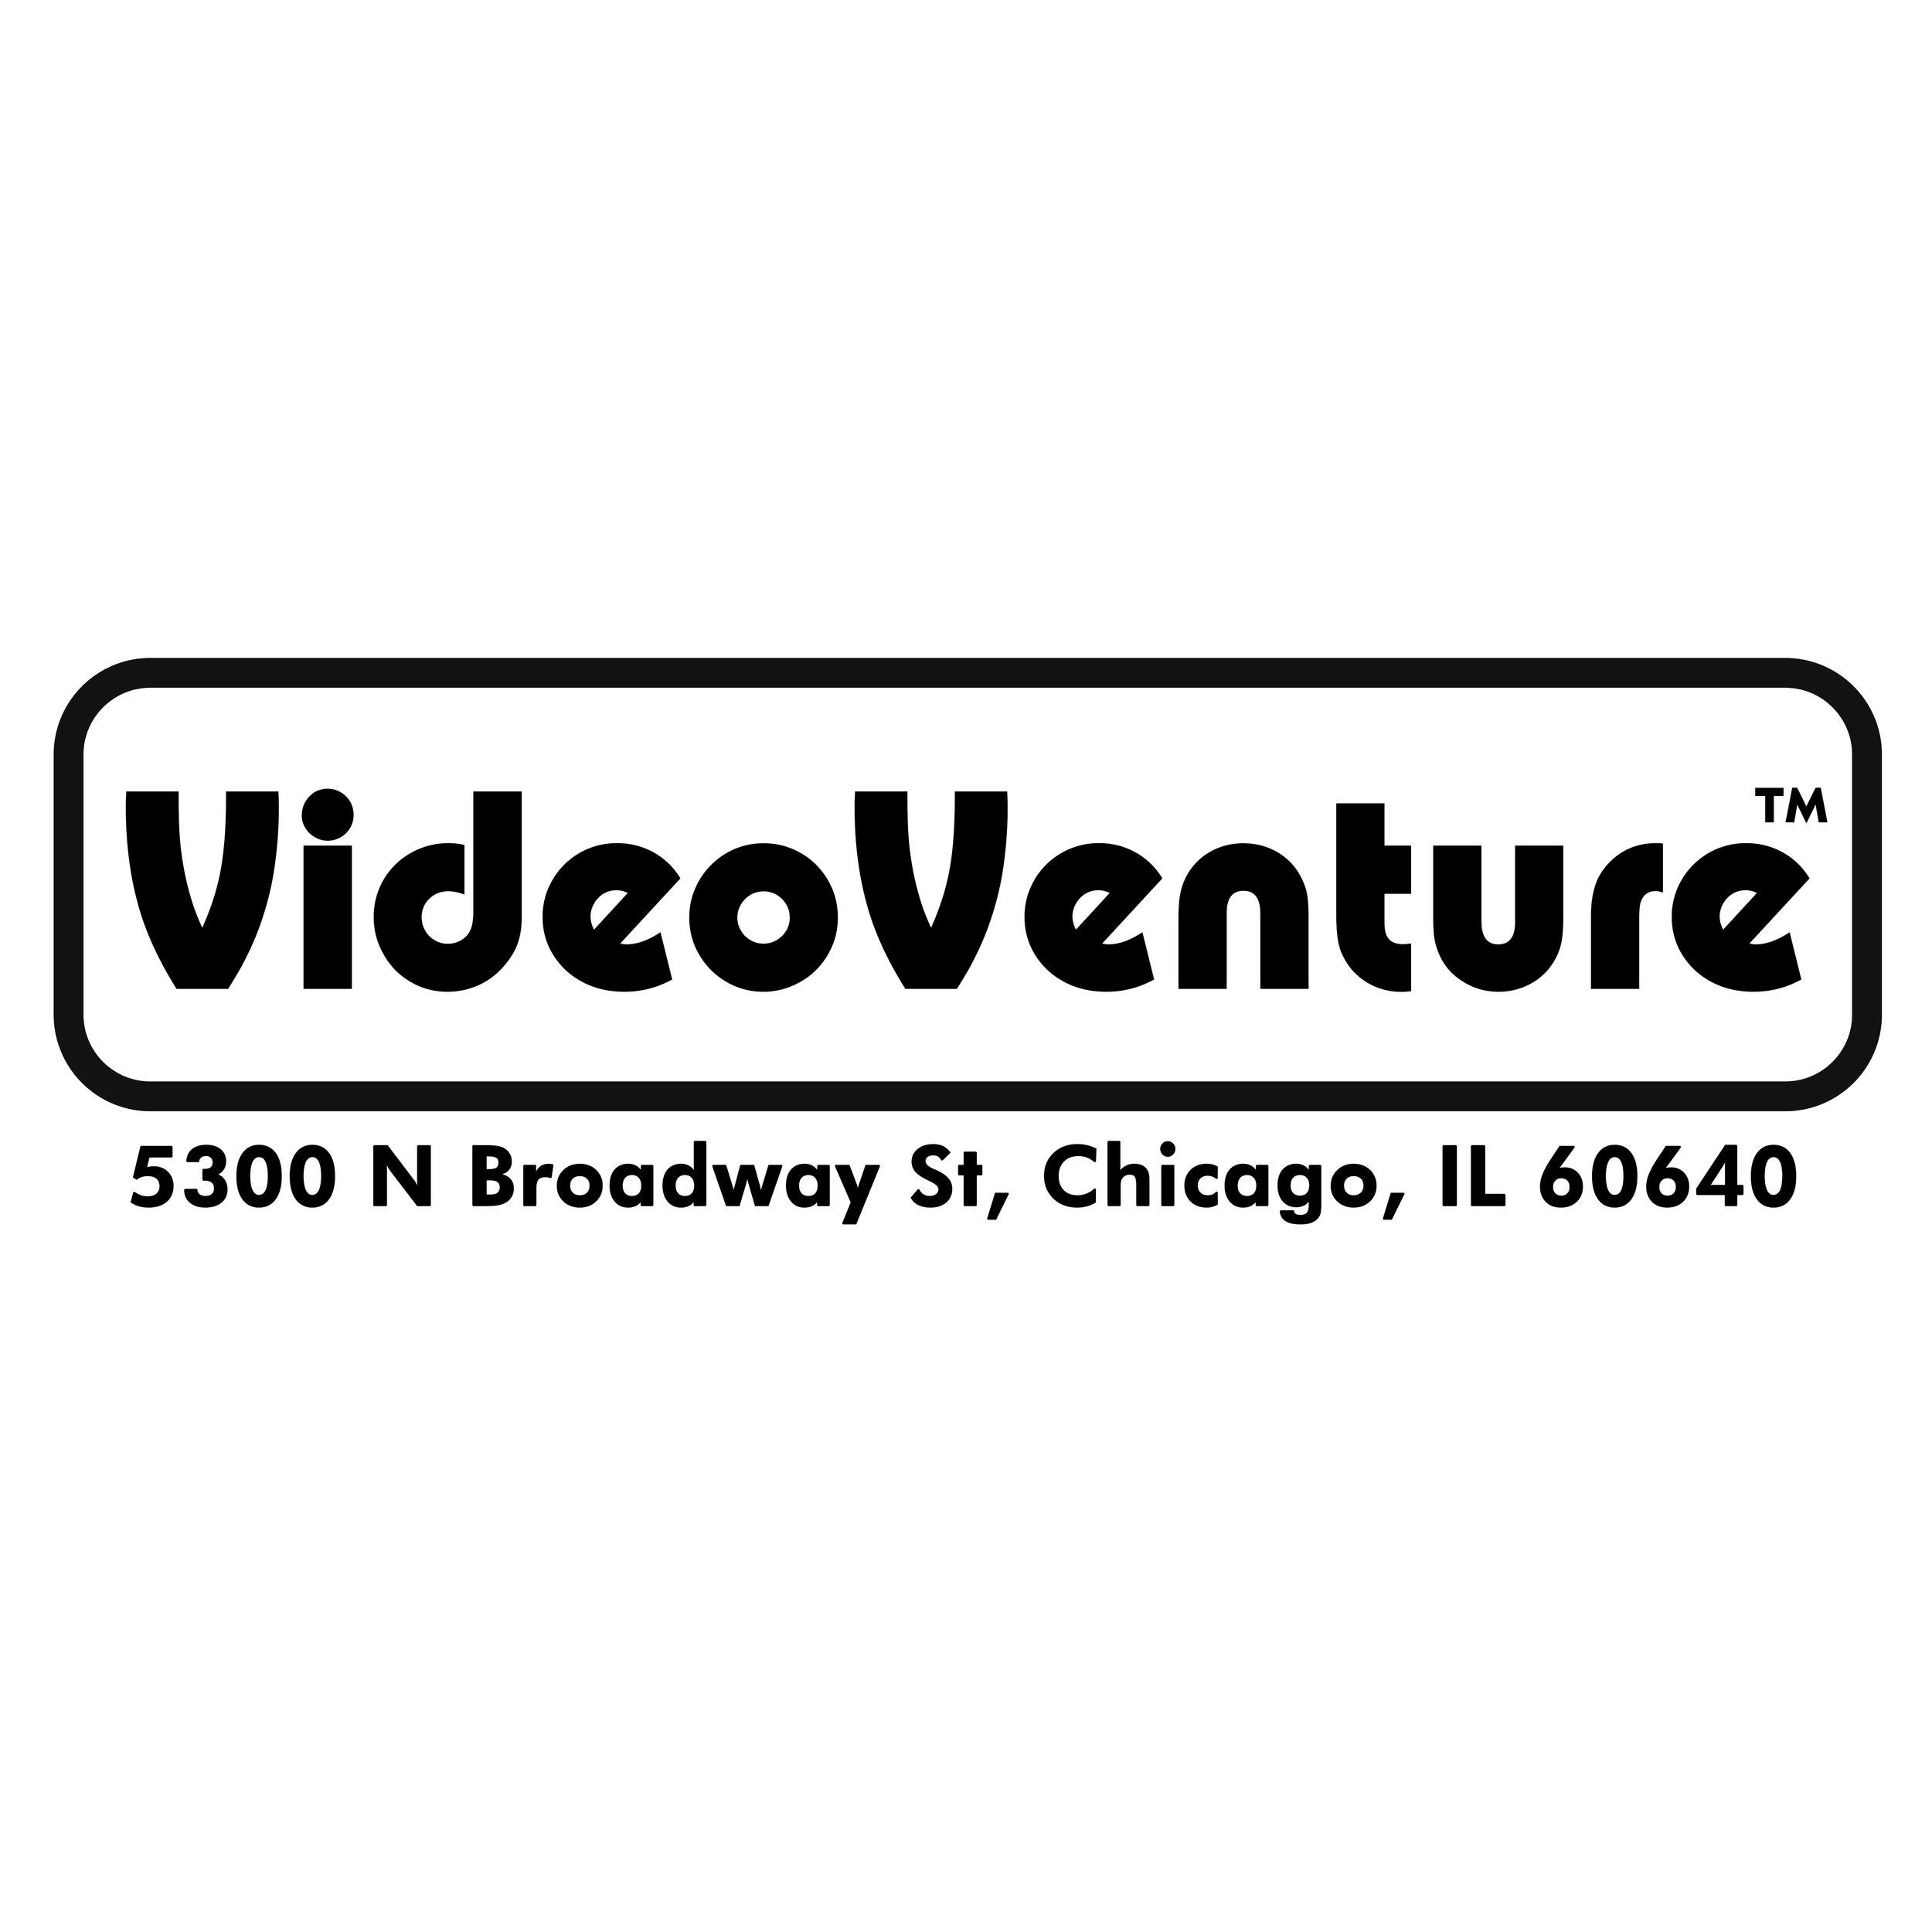 VideoVentureLogo.jpg